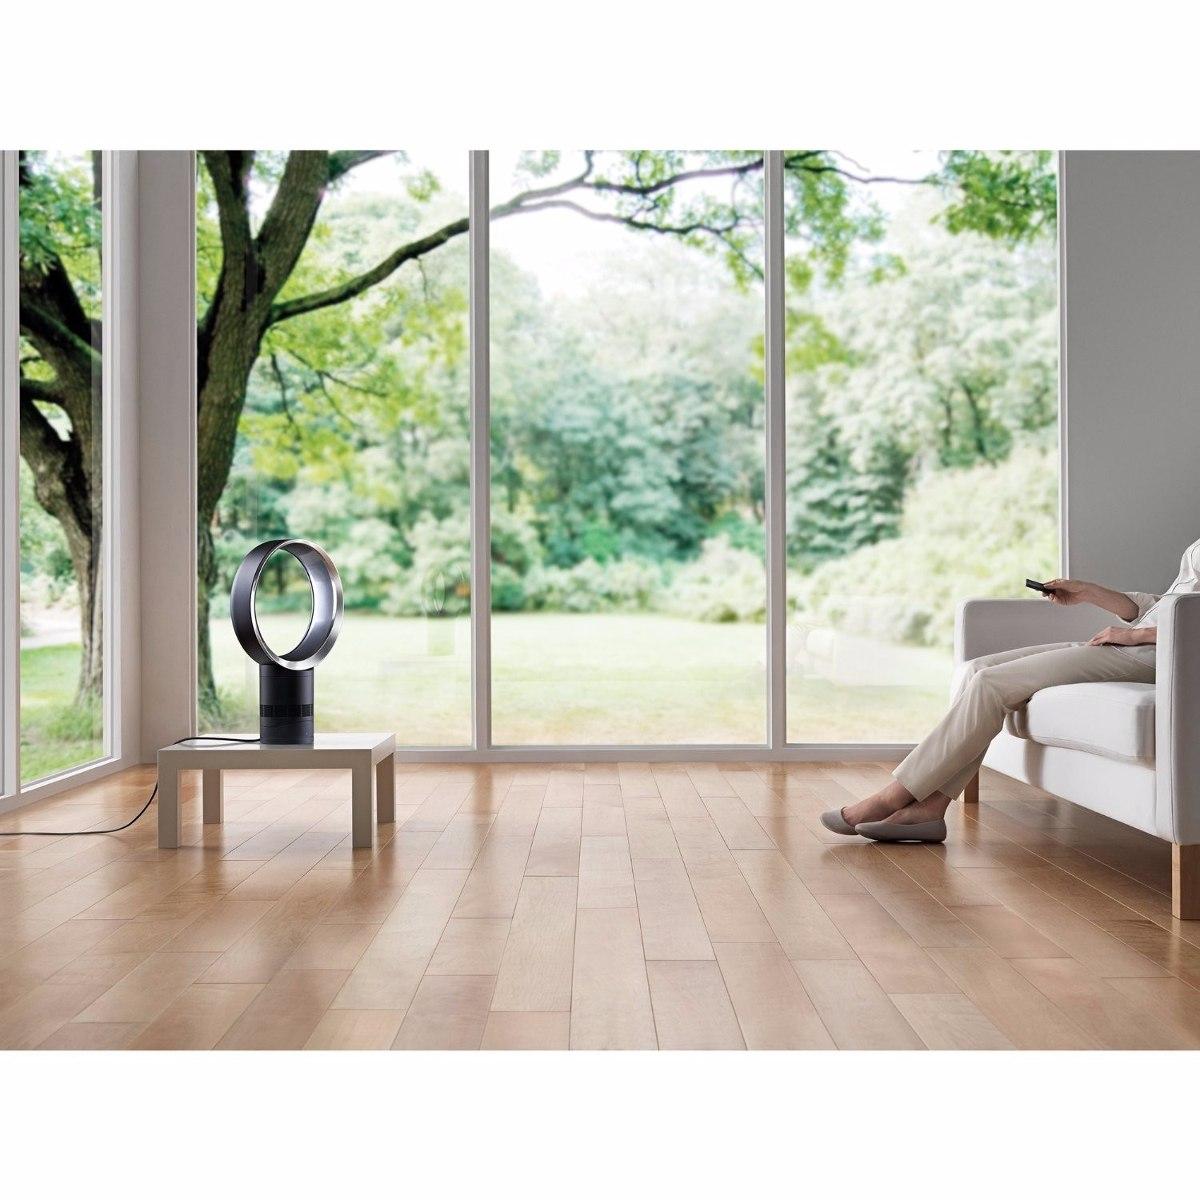 dyson air multiplier am06 ventilador de mesa negro. Black Bedroom Furniture Sets. Home Design Ideas